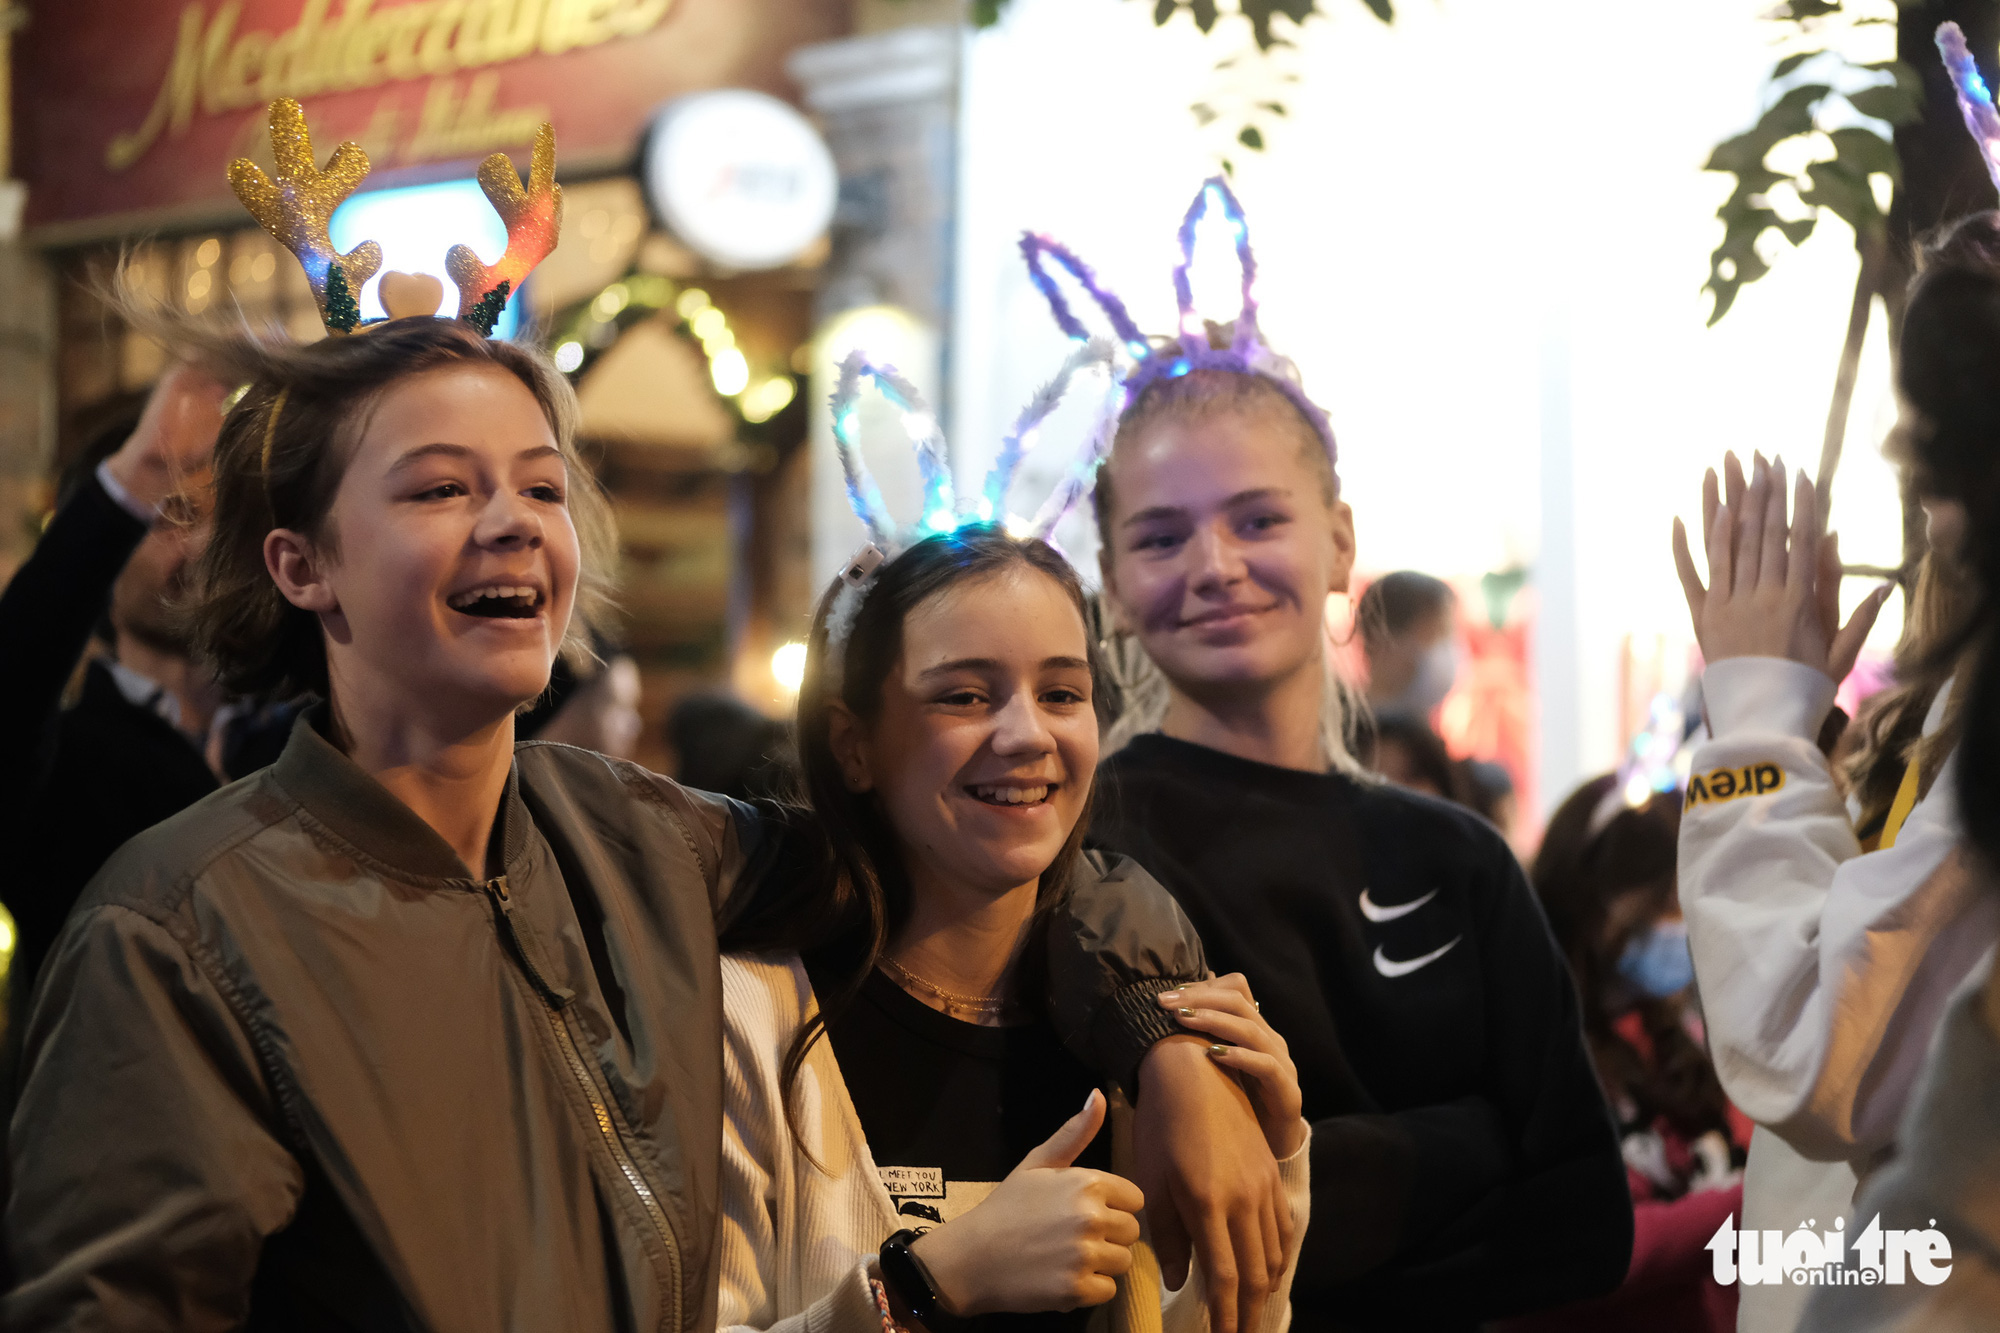 Foreign visitors celebrate Christmas Eve in Hanoi, December 24, 2020. Photo: Mai Thuong / Tuoi Tre